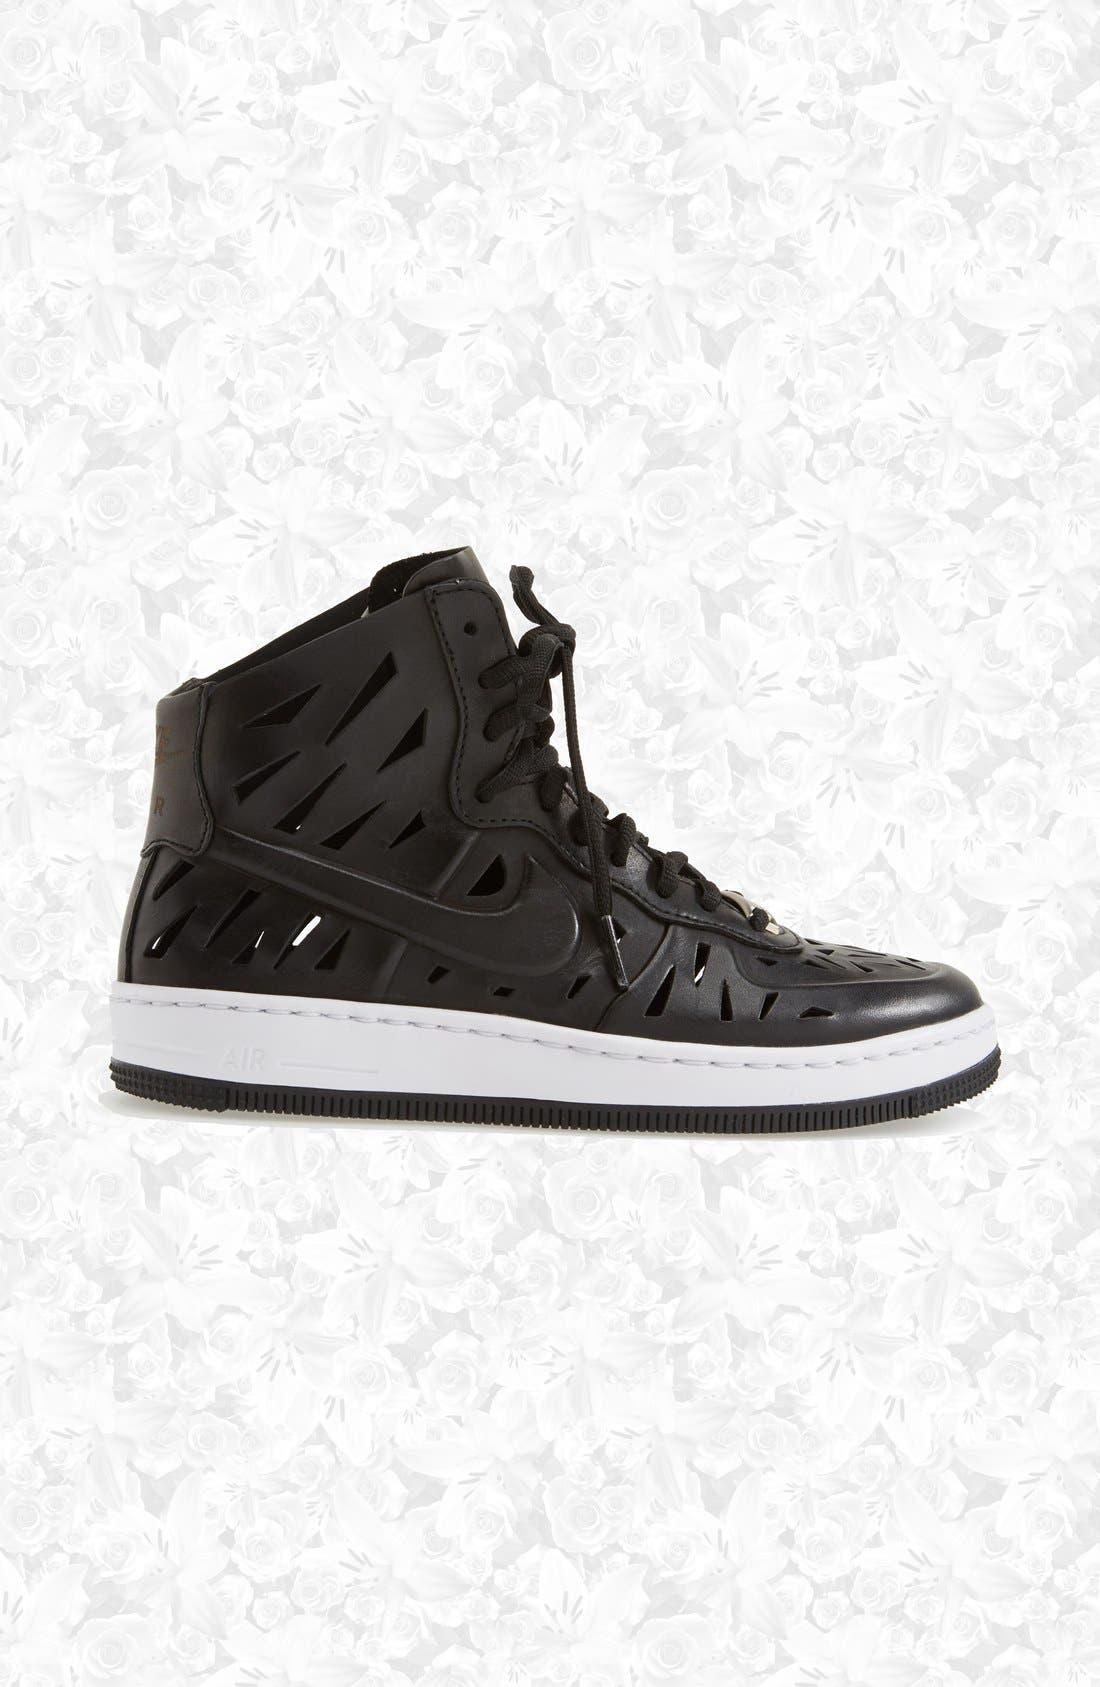 Alternate Image 1 Selected - Nike 'AF1 Ultra Force Mid Joli' High Top Sneaker (Women)